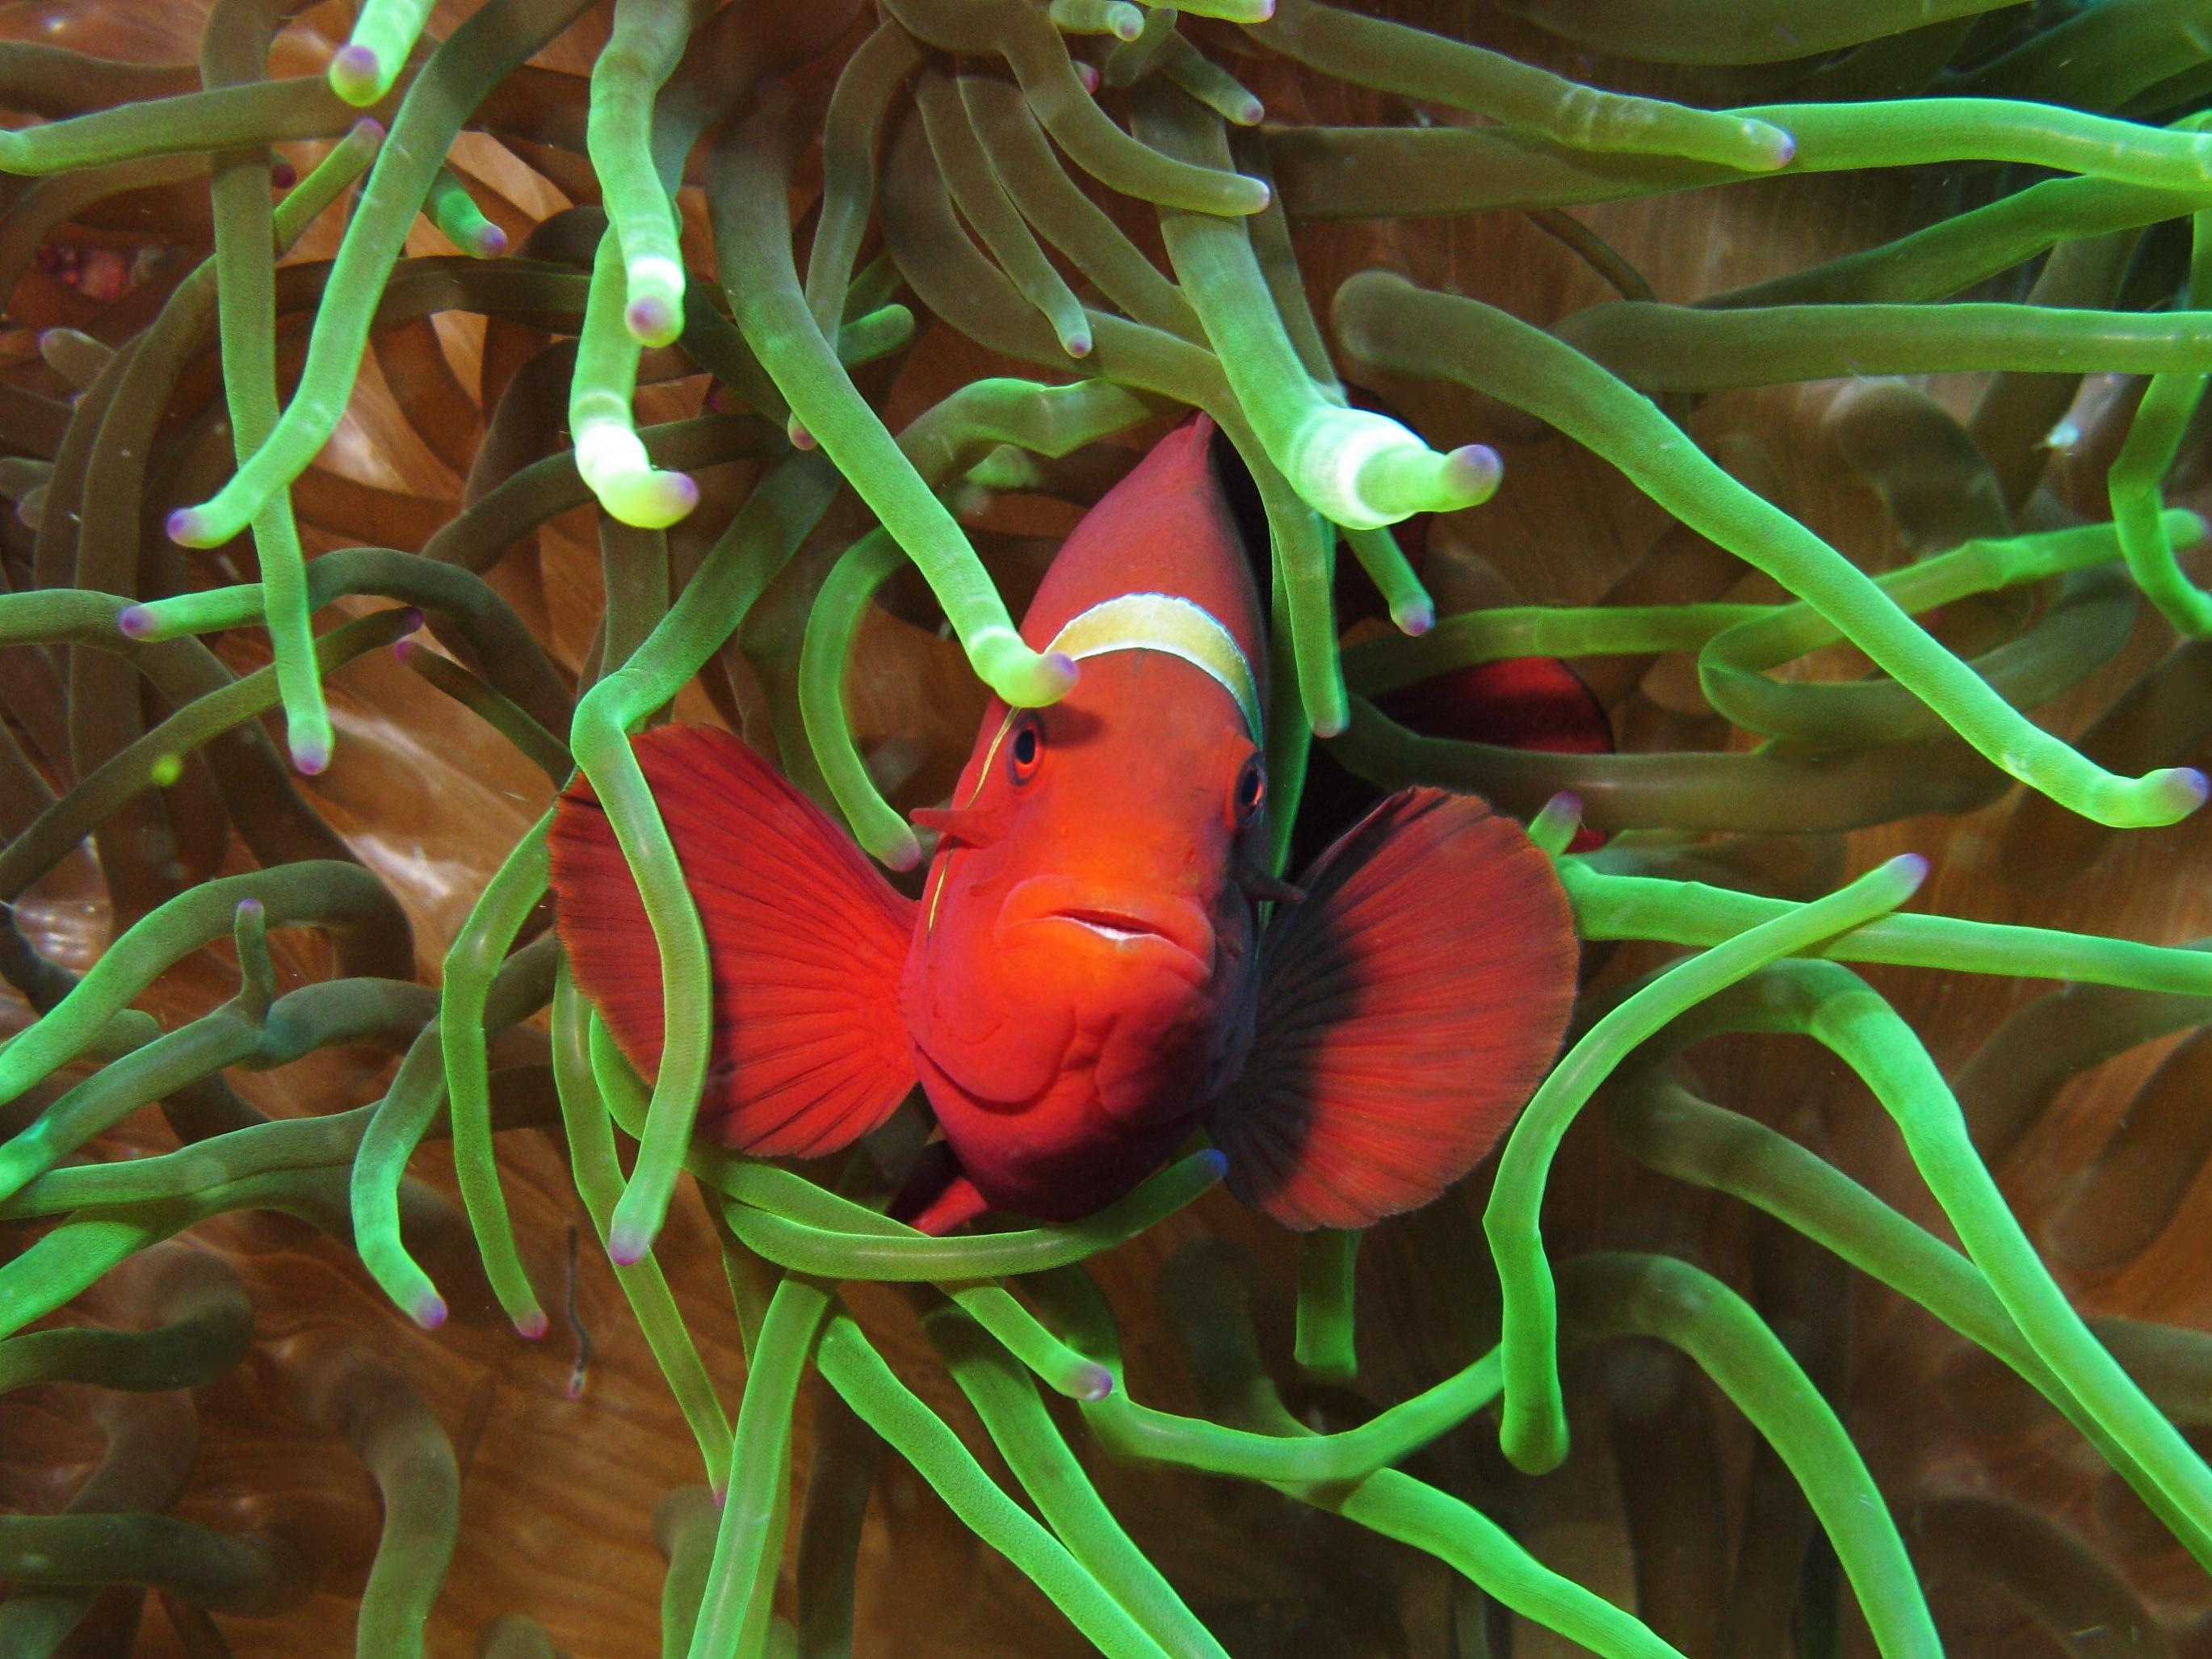 File:Maroon clownfish at Gilli Lawa Laut.JPG - Wikimedia Commons